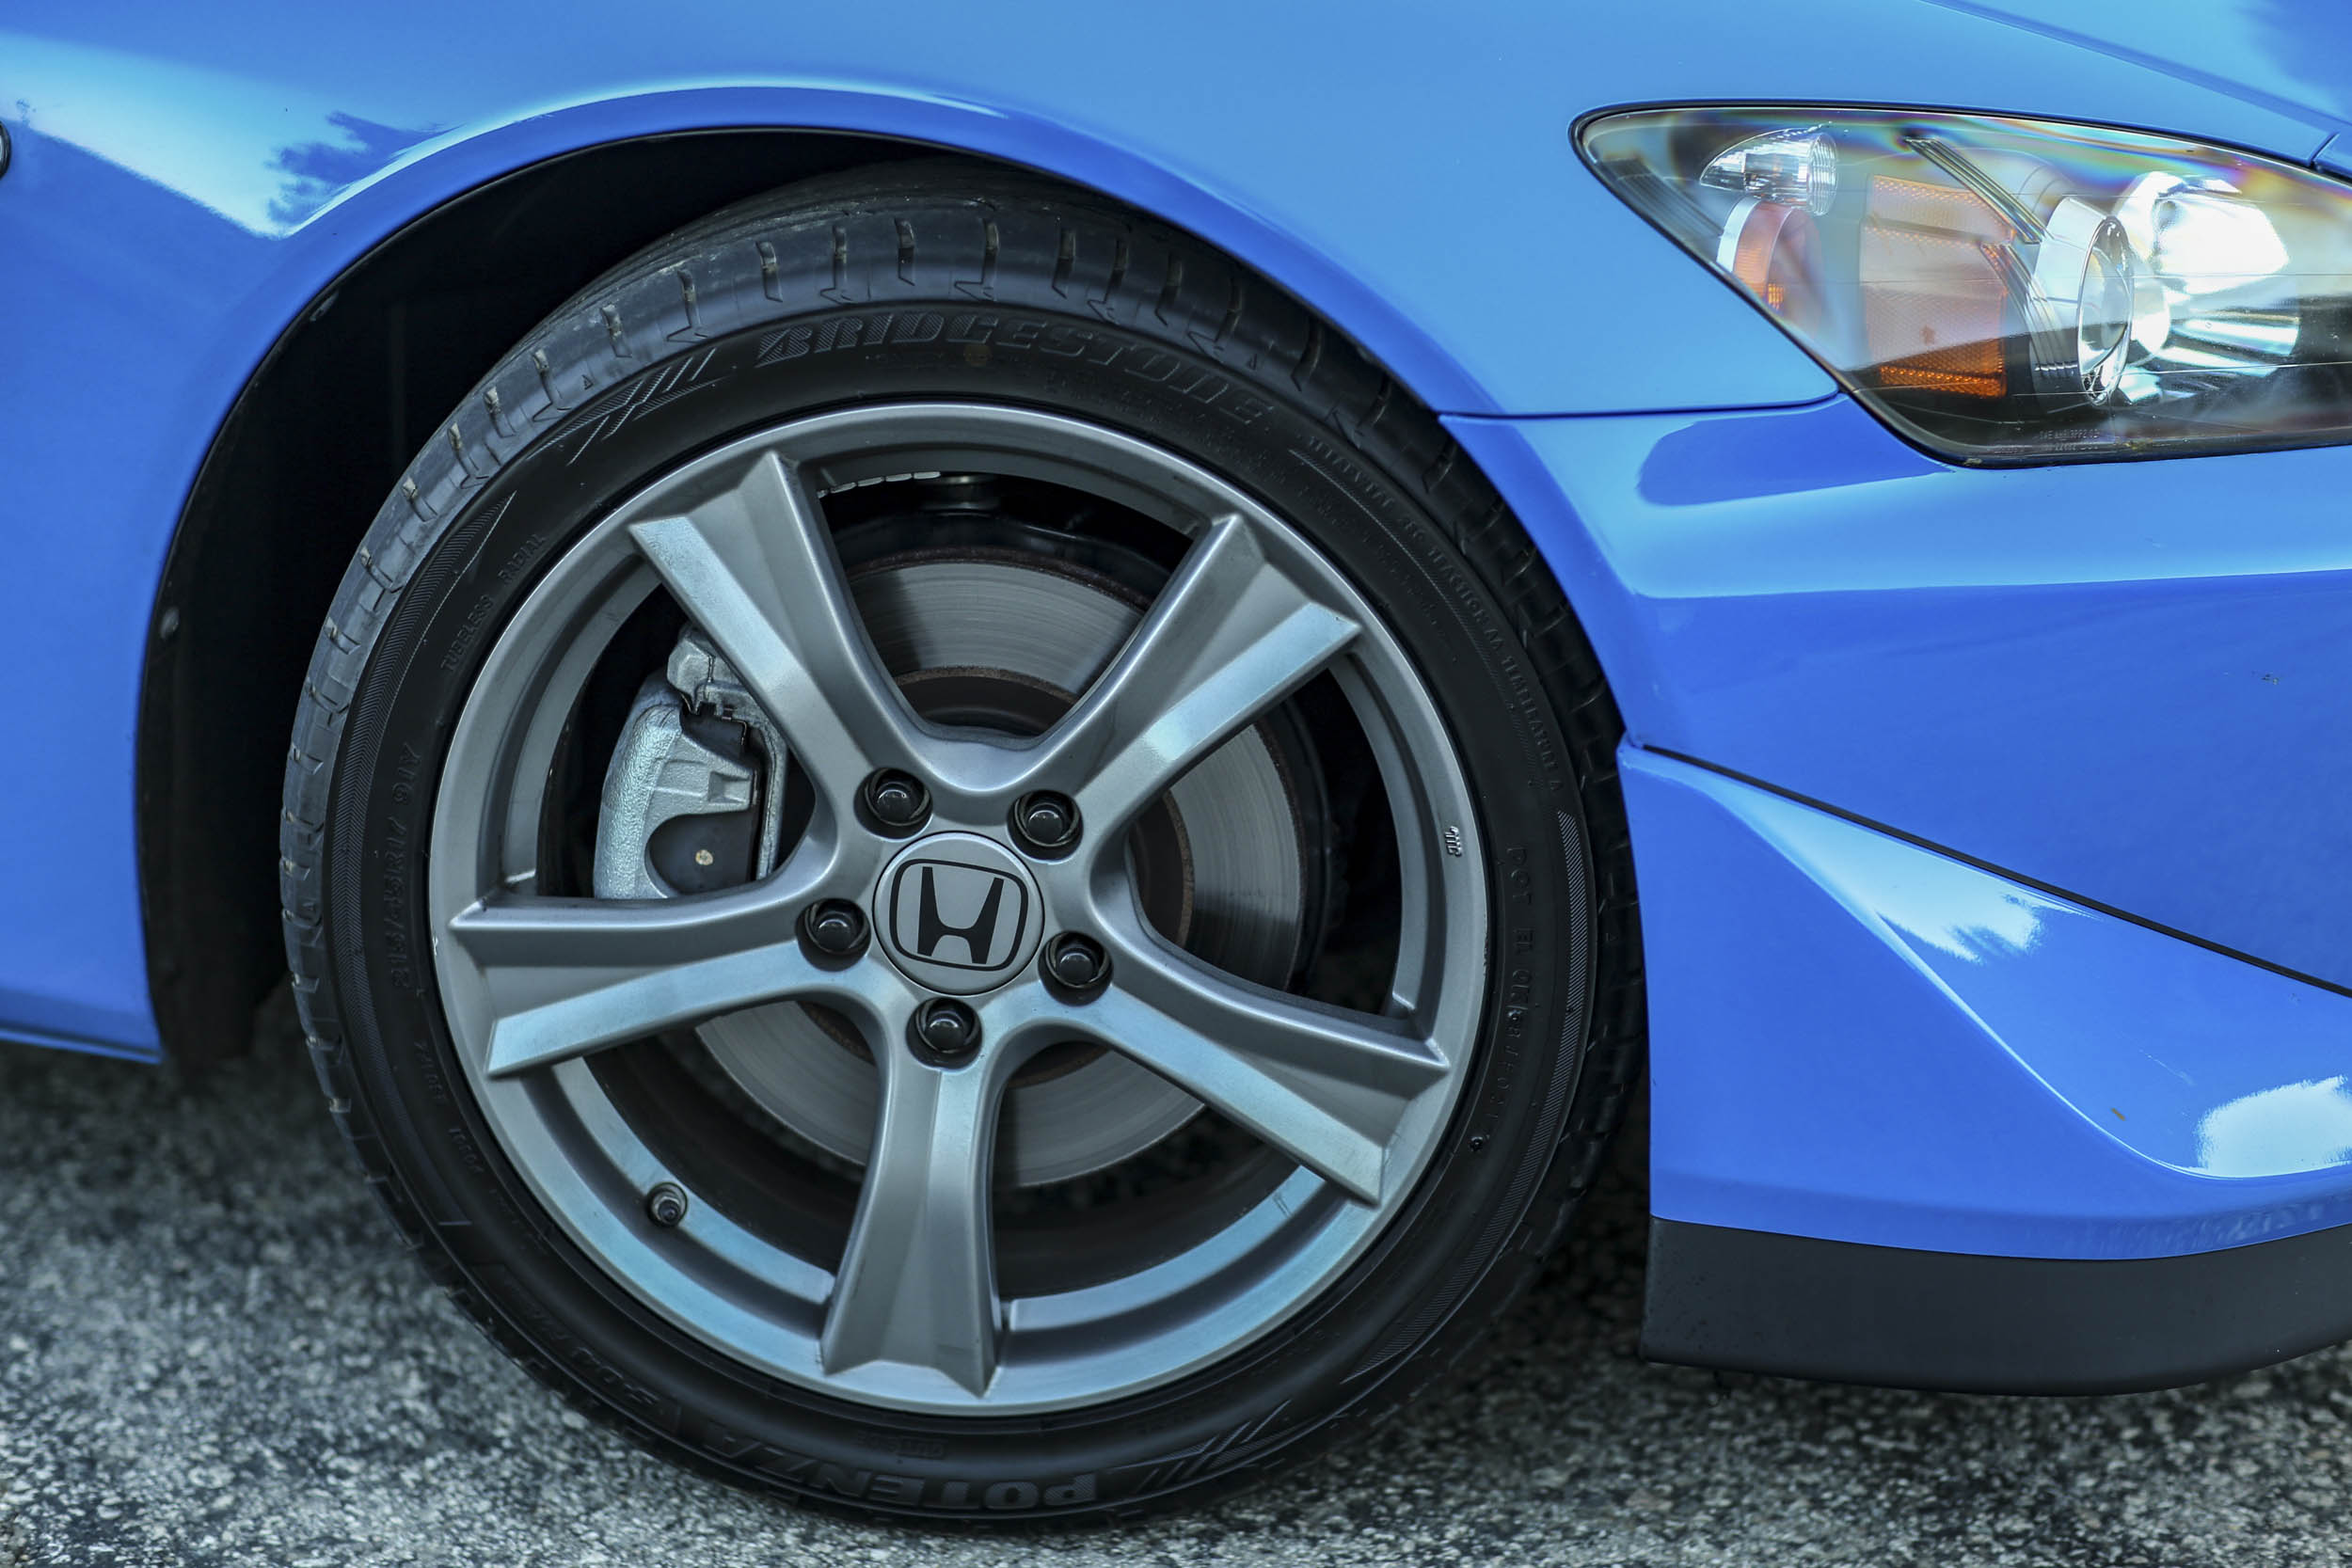 Honda S2000 wheel front brakes